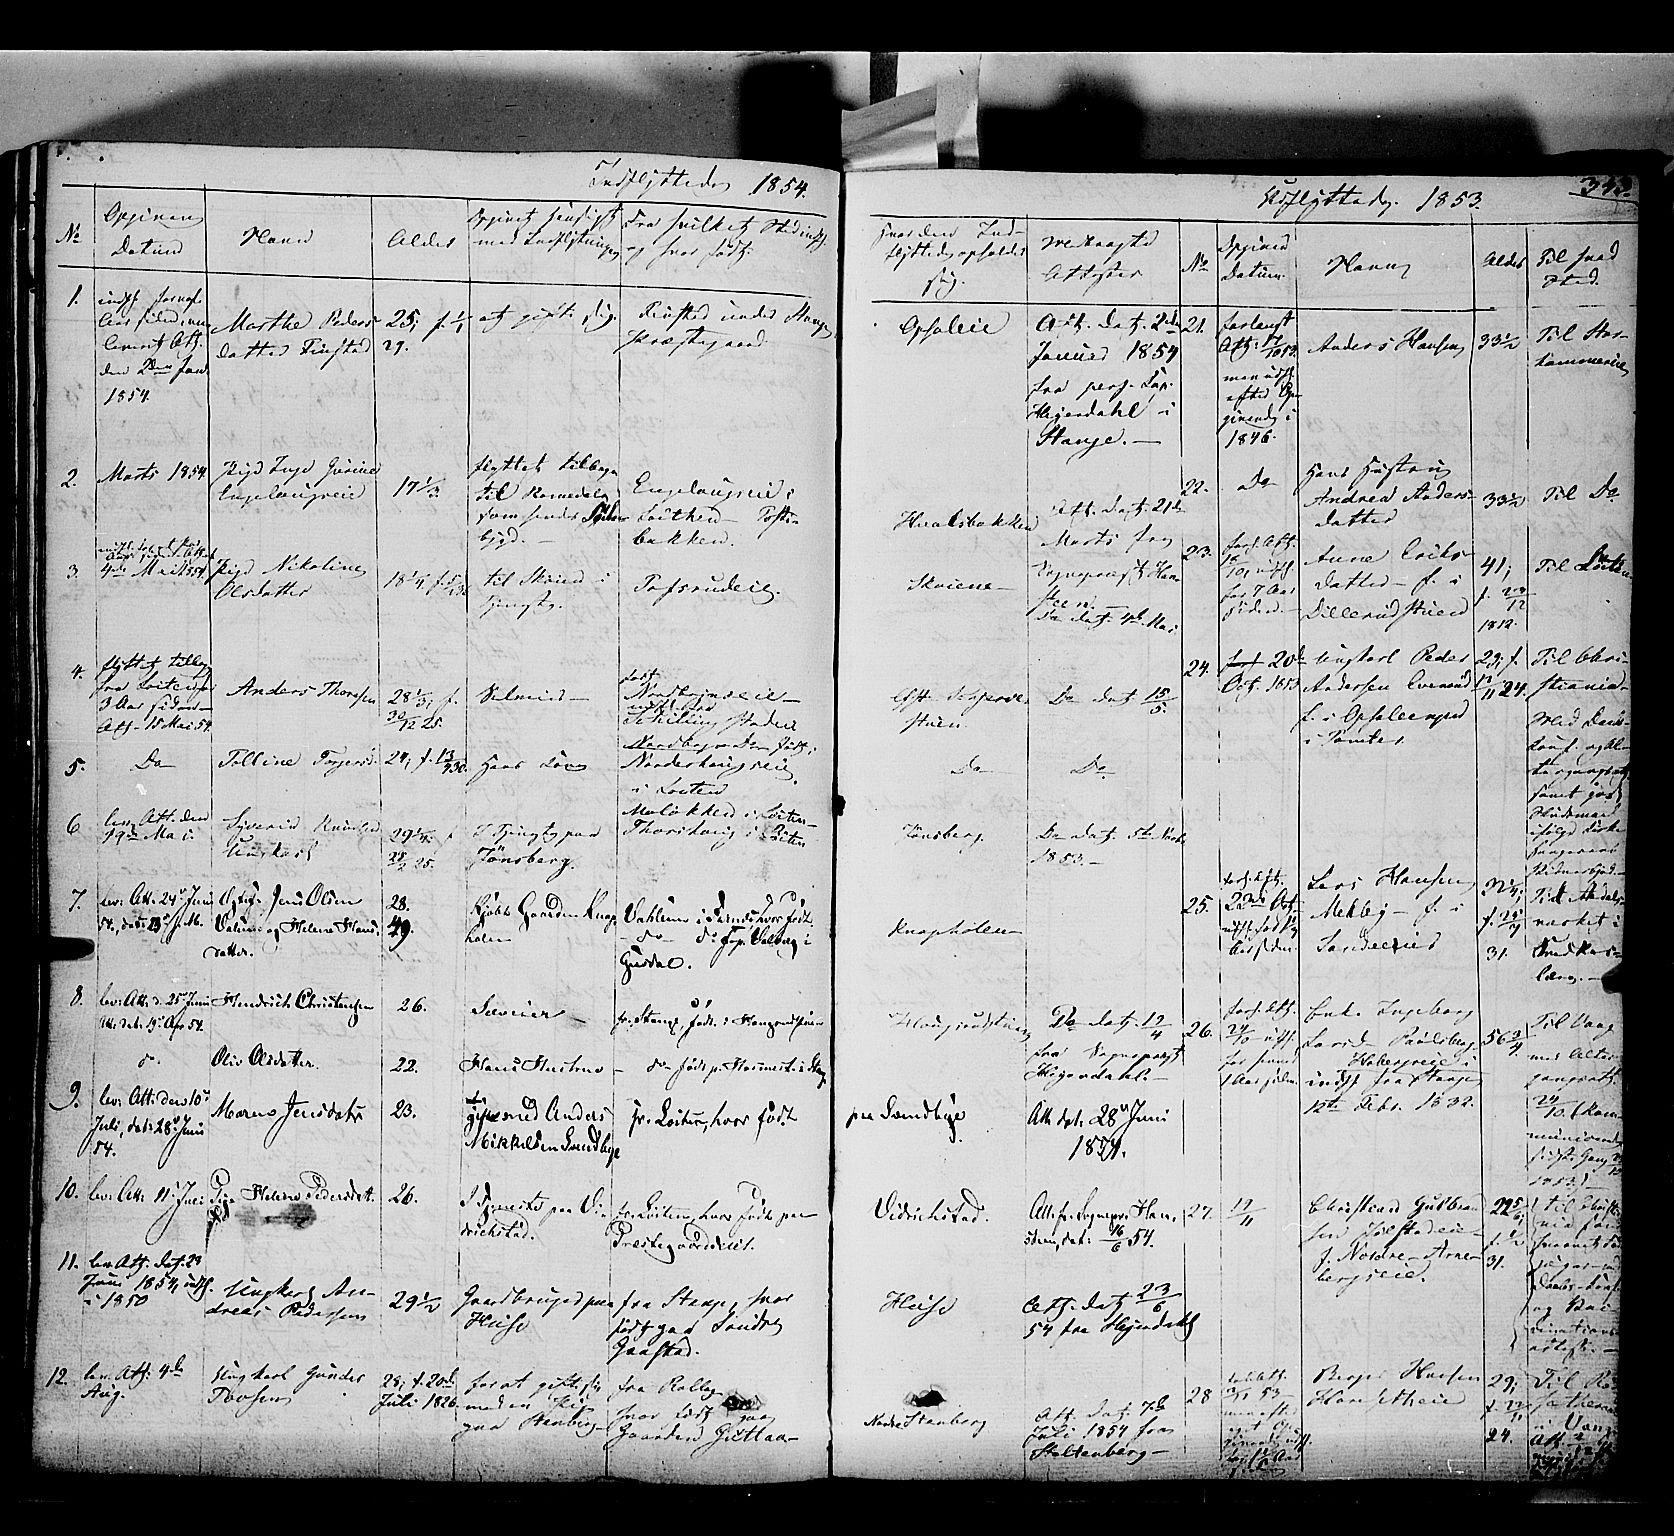 SAH, Romedal prestekontor, K/L0004: Ministerialbok nr. 4, 1847-1861, s. 343